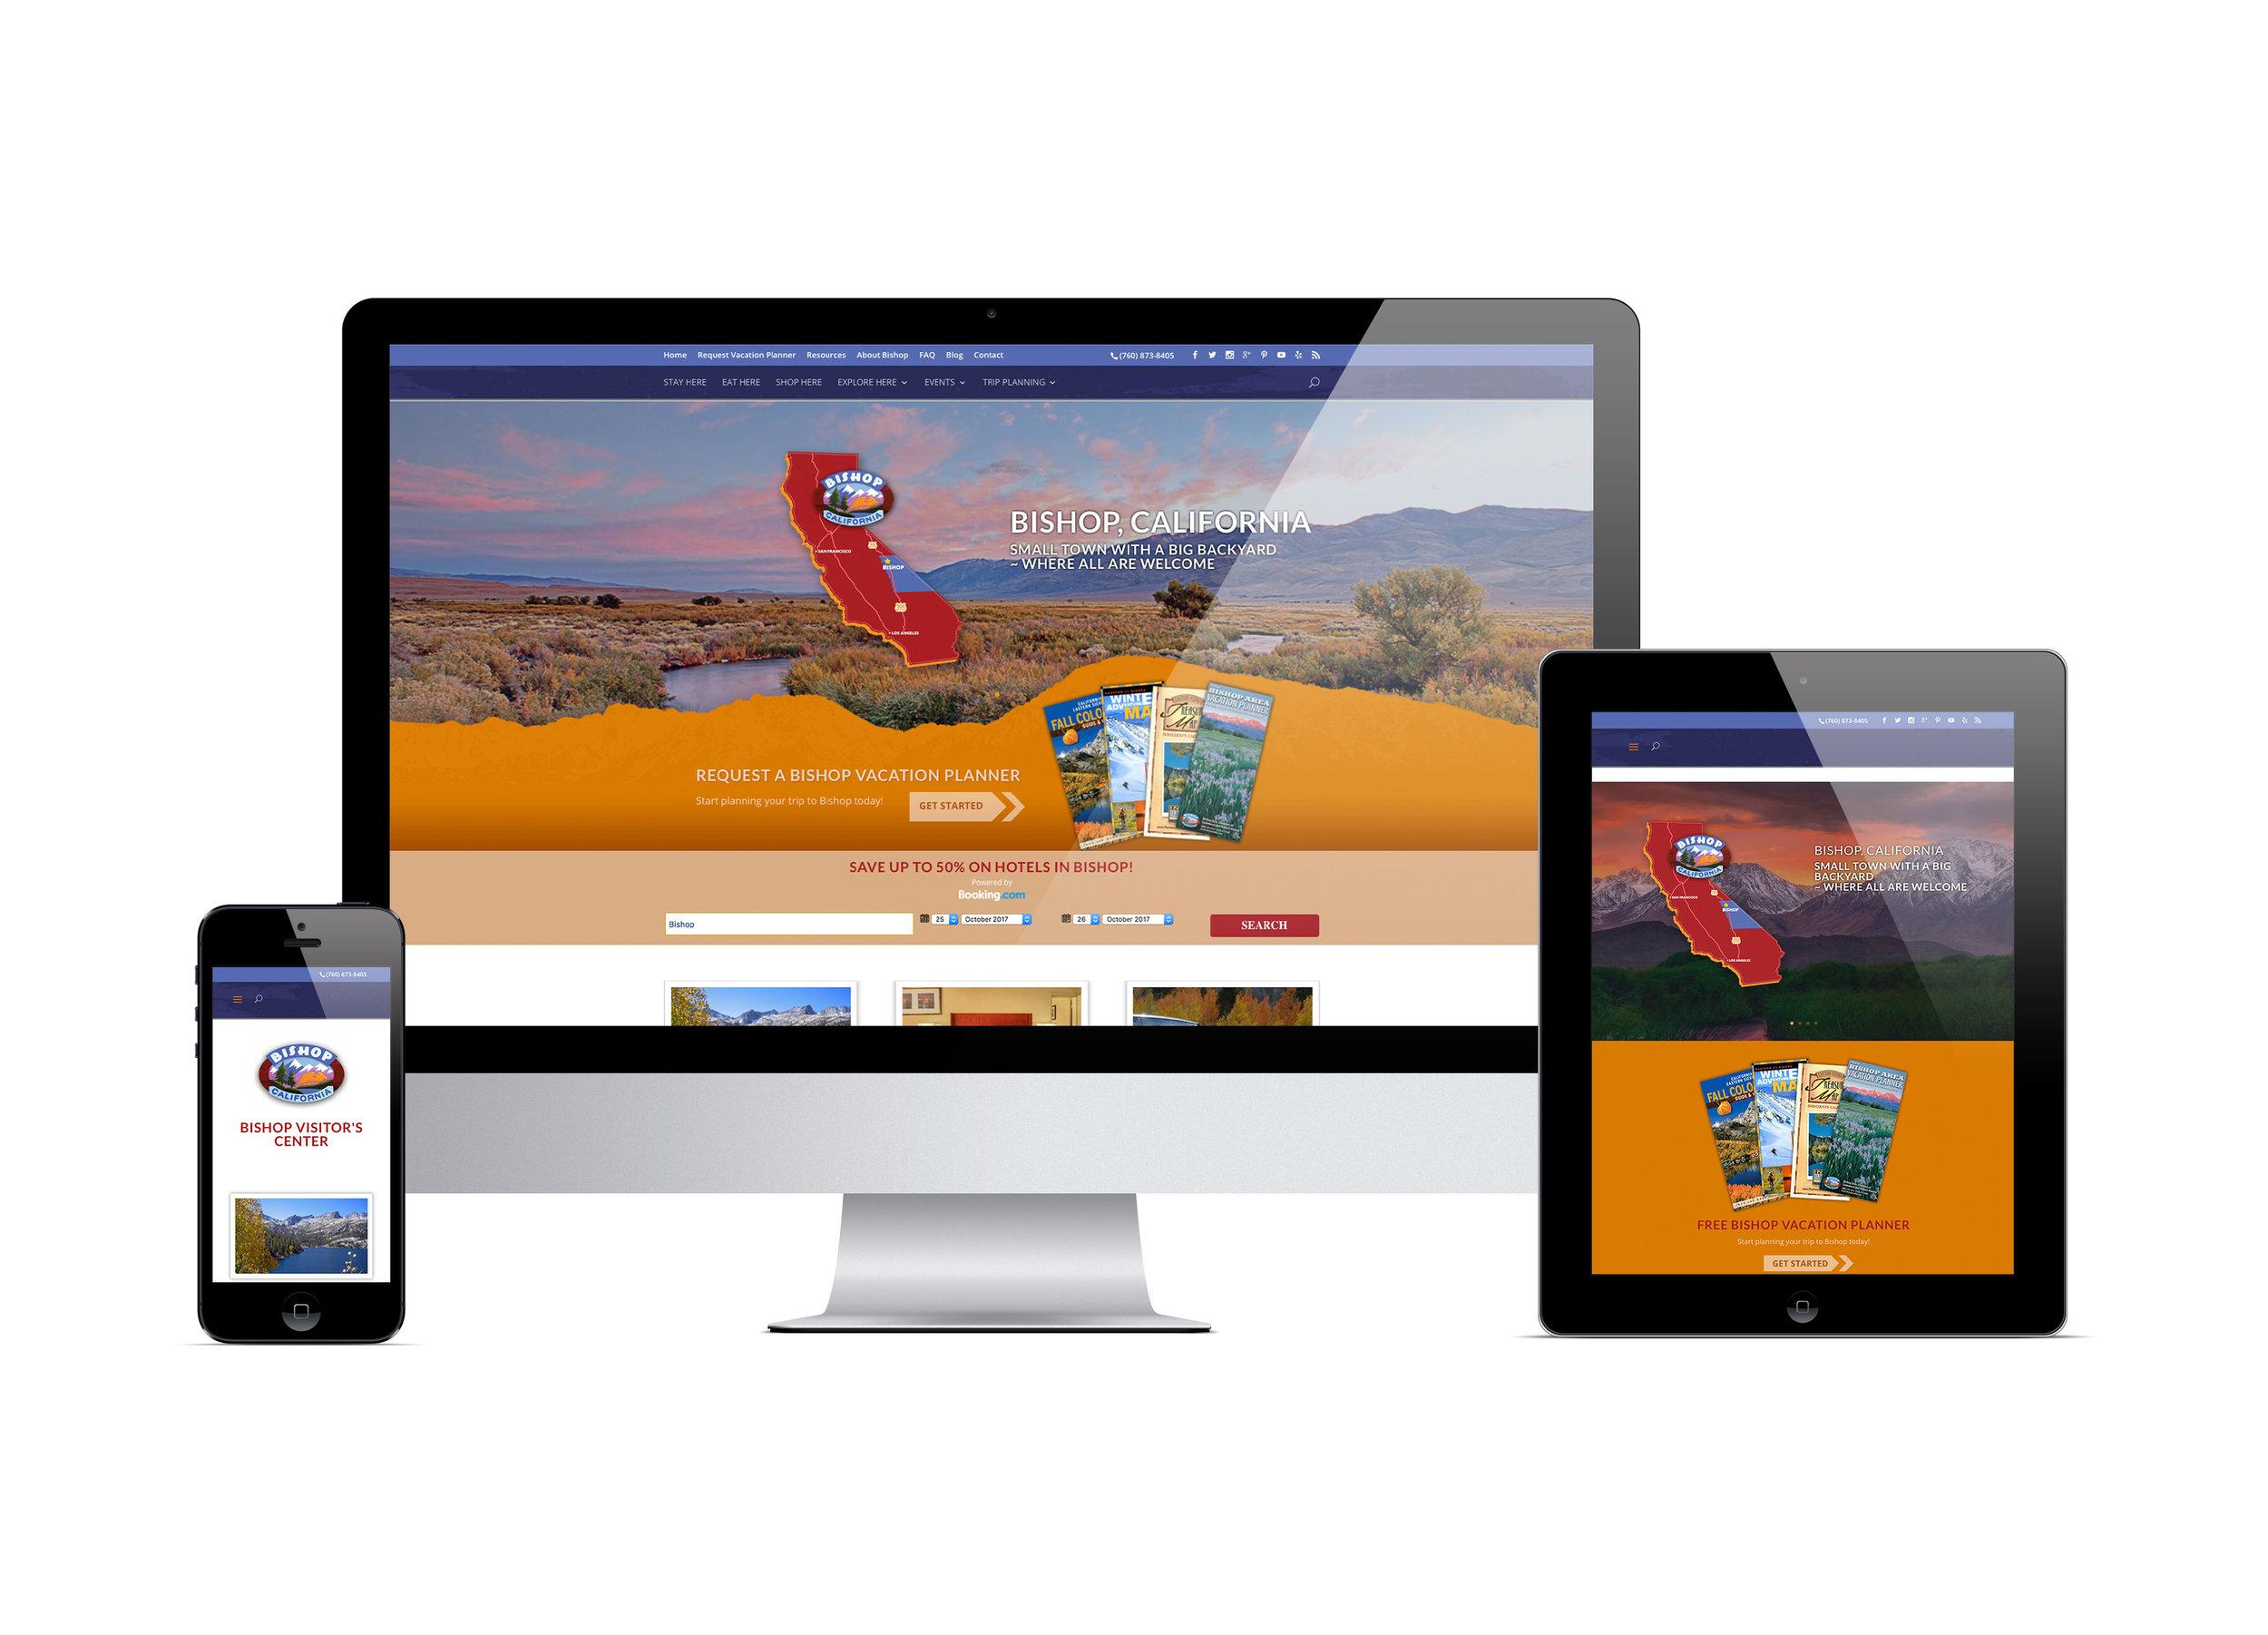 WebsiteDesignMockupCrop.jpg